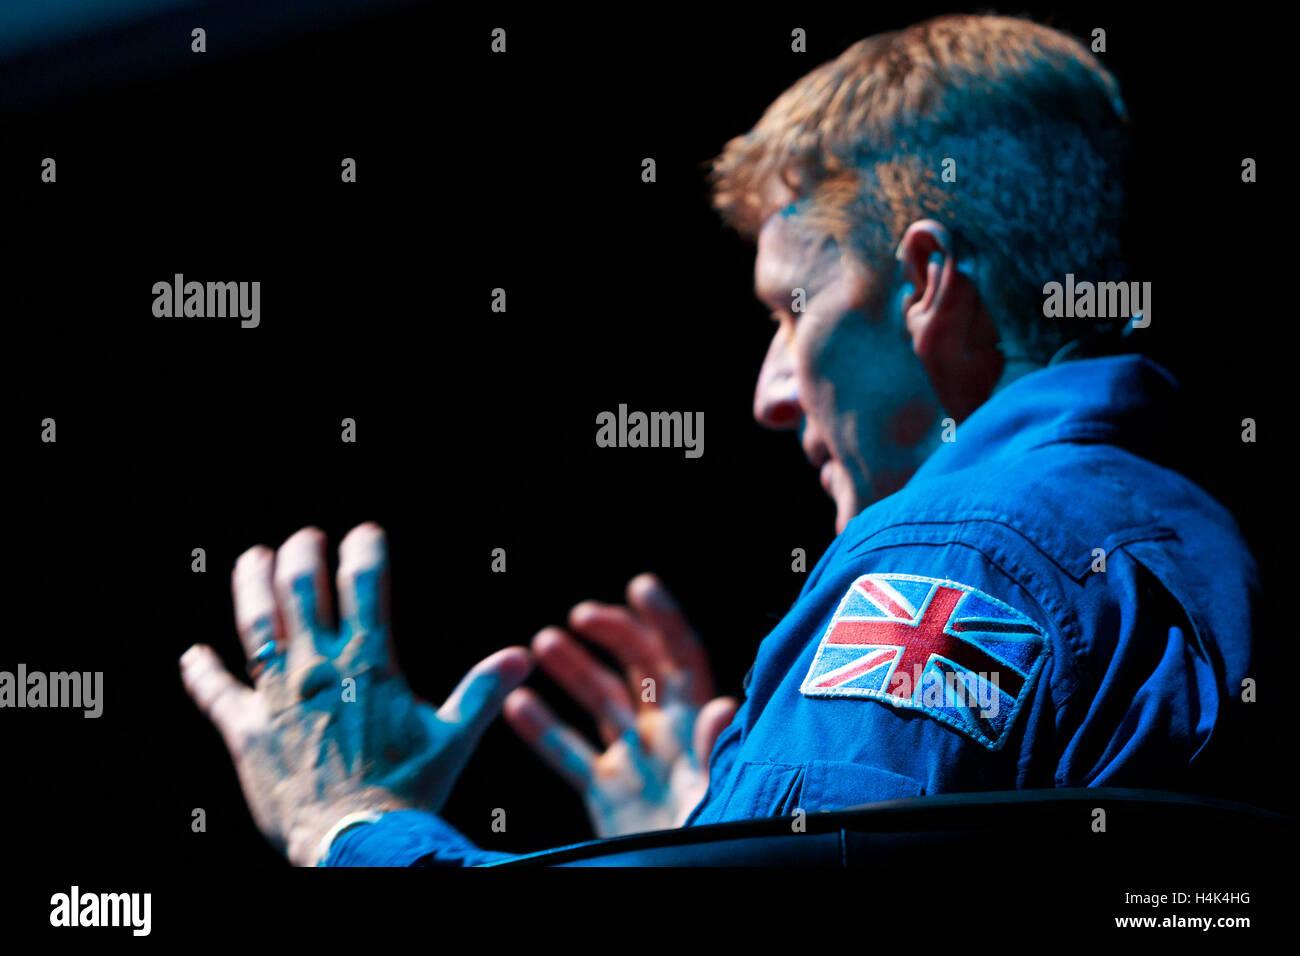 Edinburgh, UK. 17th October 2016. Edinburgh International Science Festival in partnership with European Space Agency - Stock Image